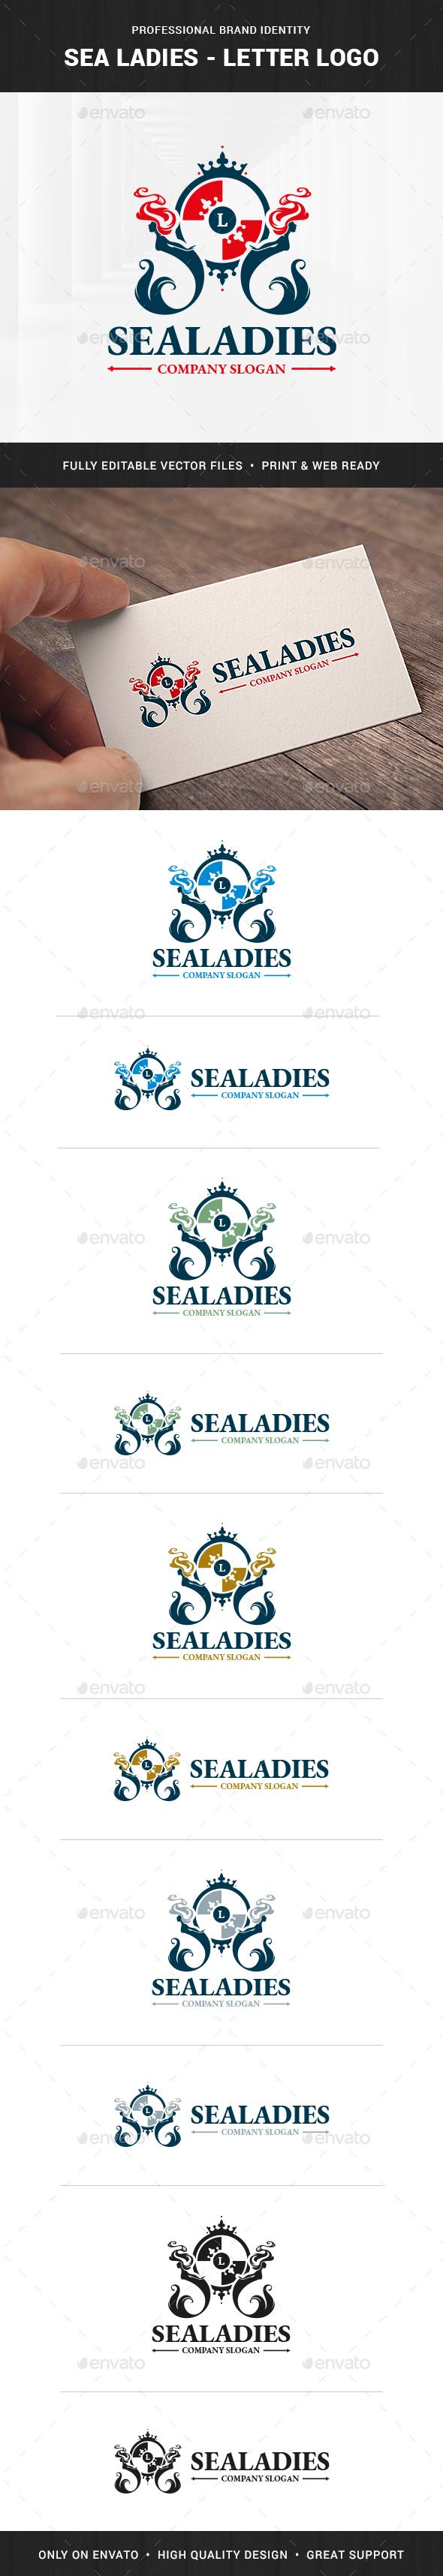 Sea Ladies - Letter Logo Template